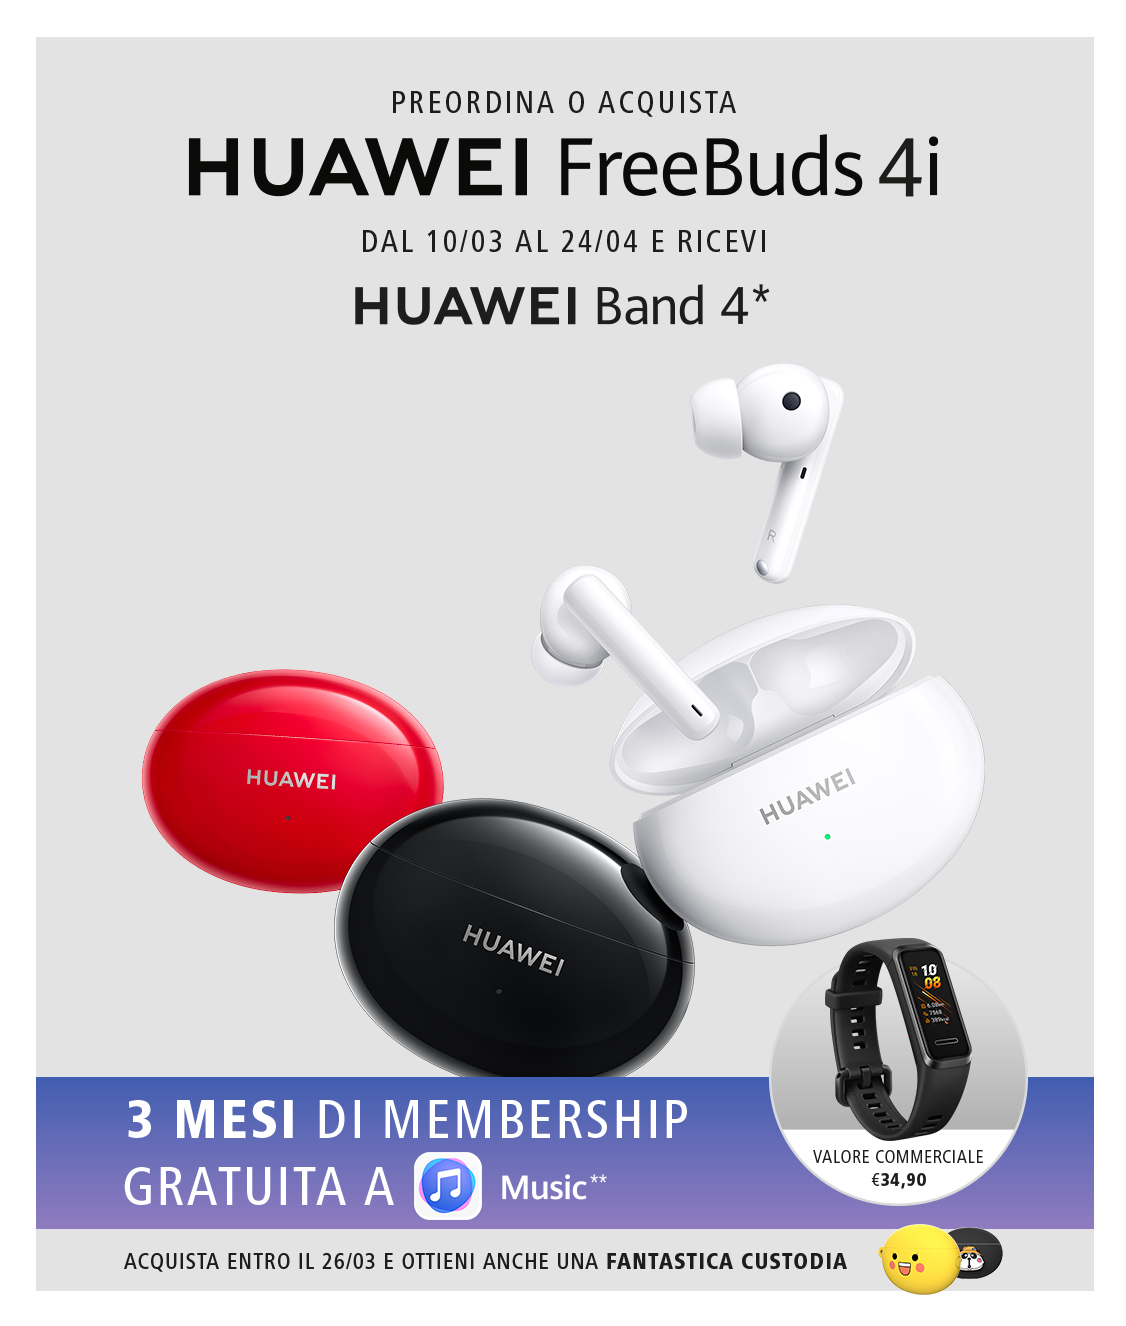 huawei freebuds 4i promozione lancio